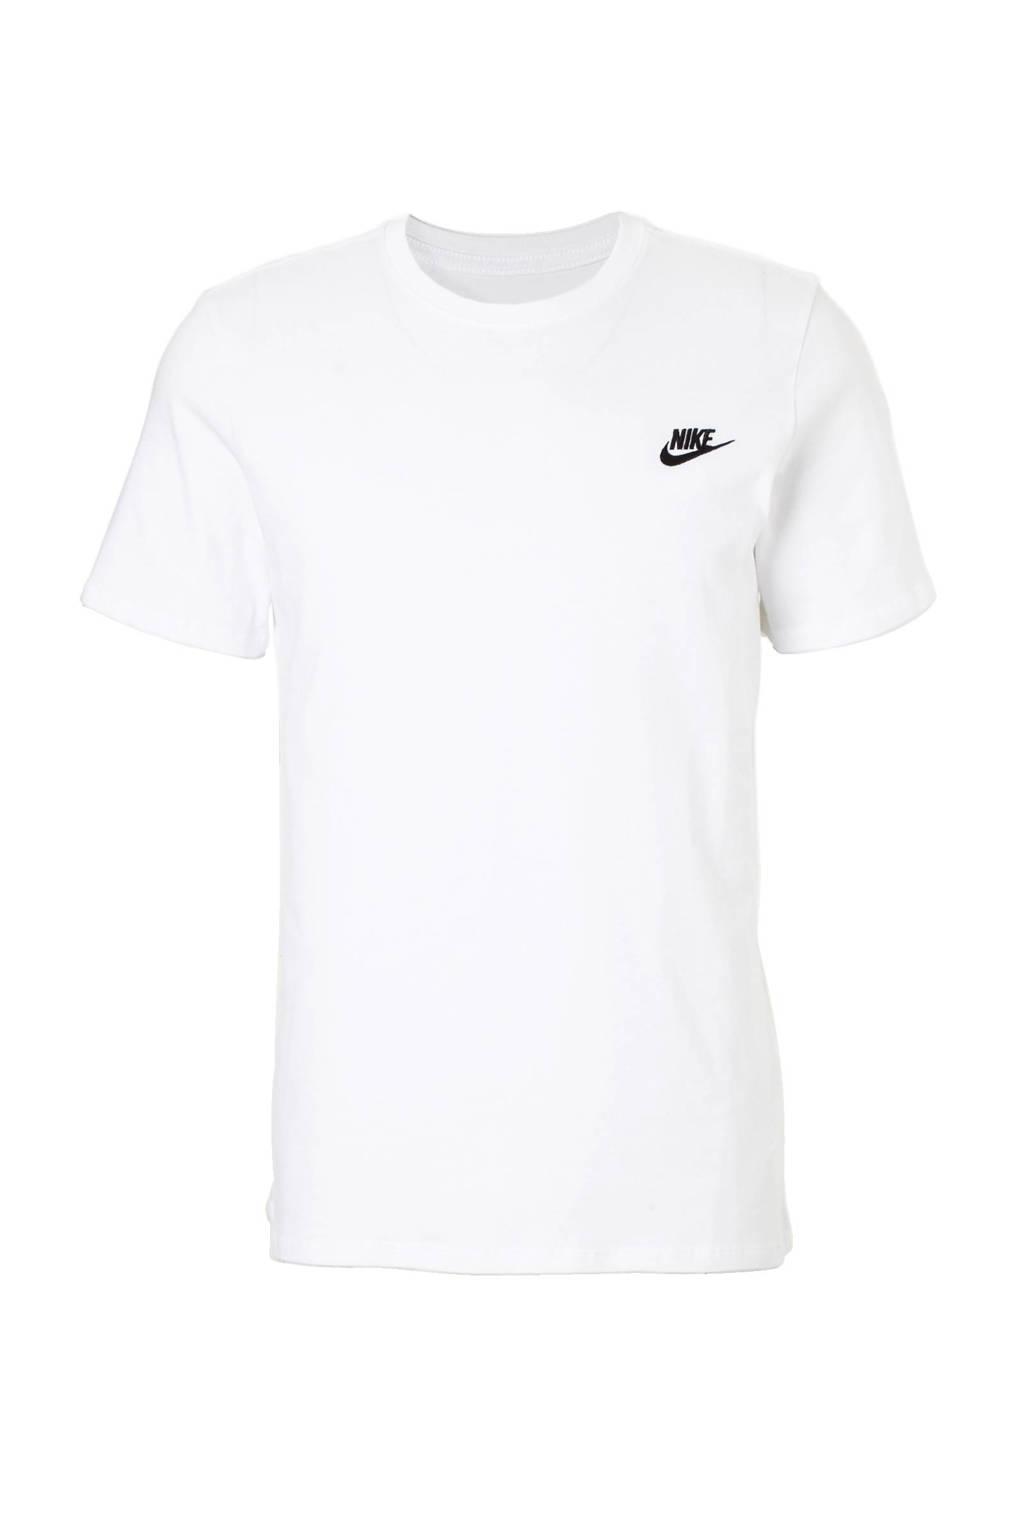 3622b80e2f5 Nike sport T-shirt | wehkamp